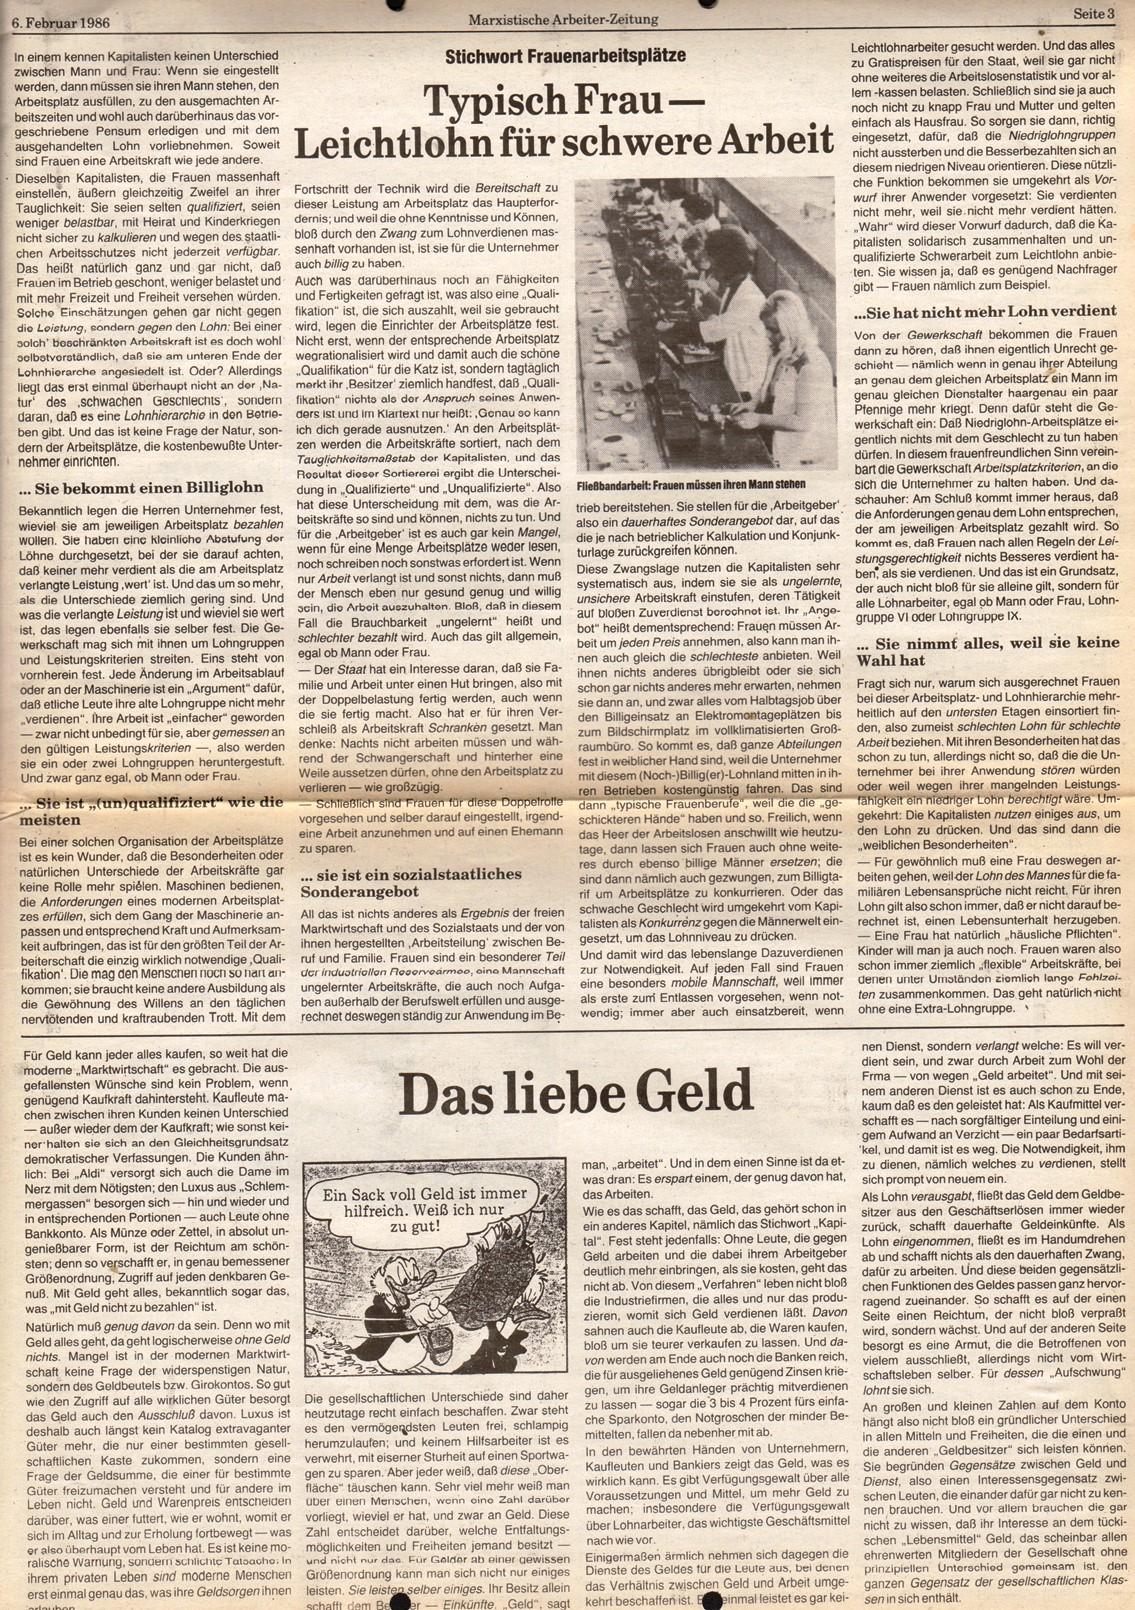 Muenchen_MG_MAZ_Krauss_Maffei_19860206_03